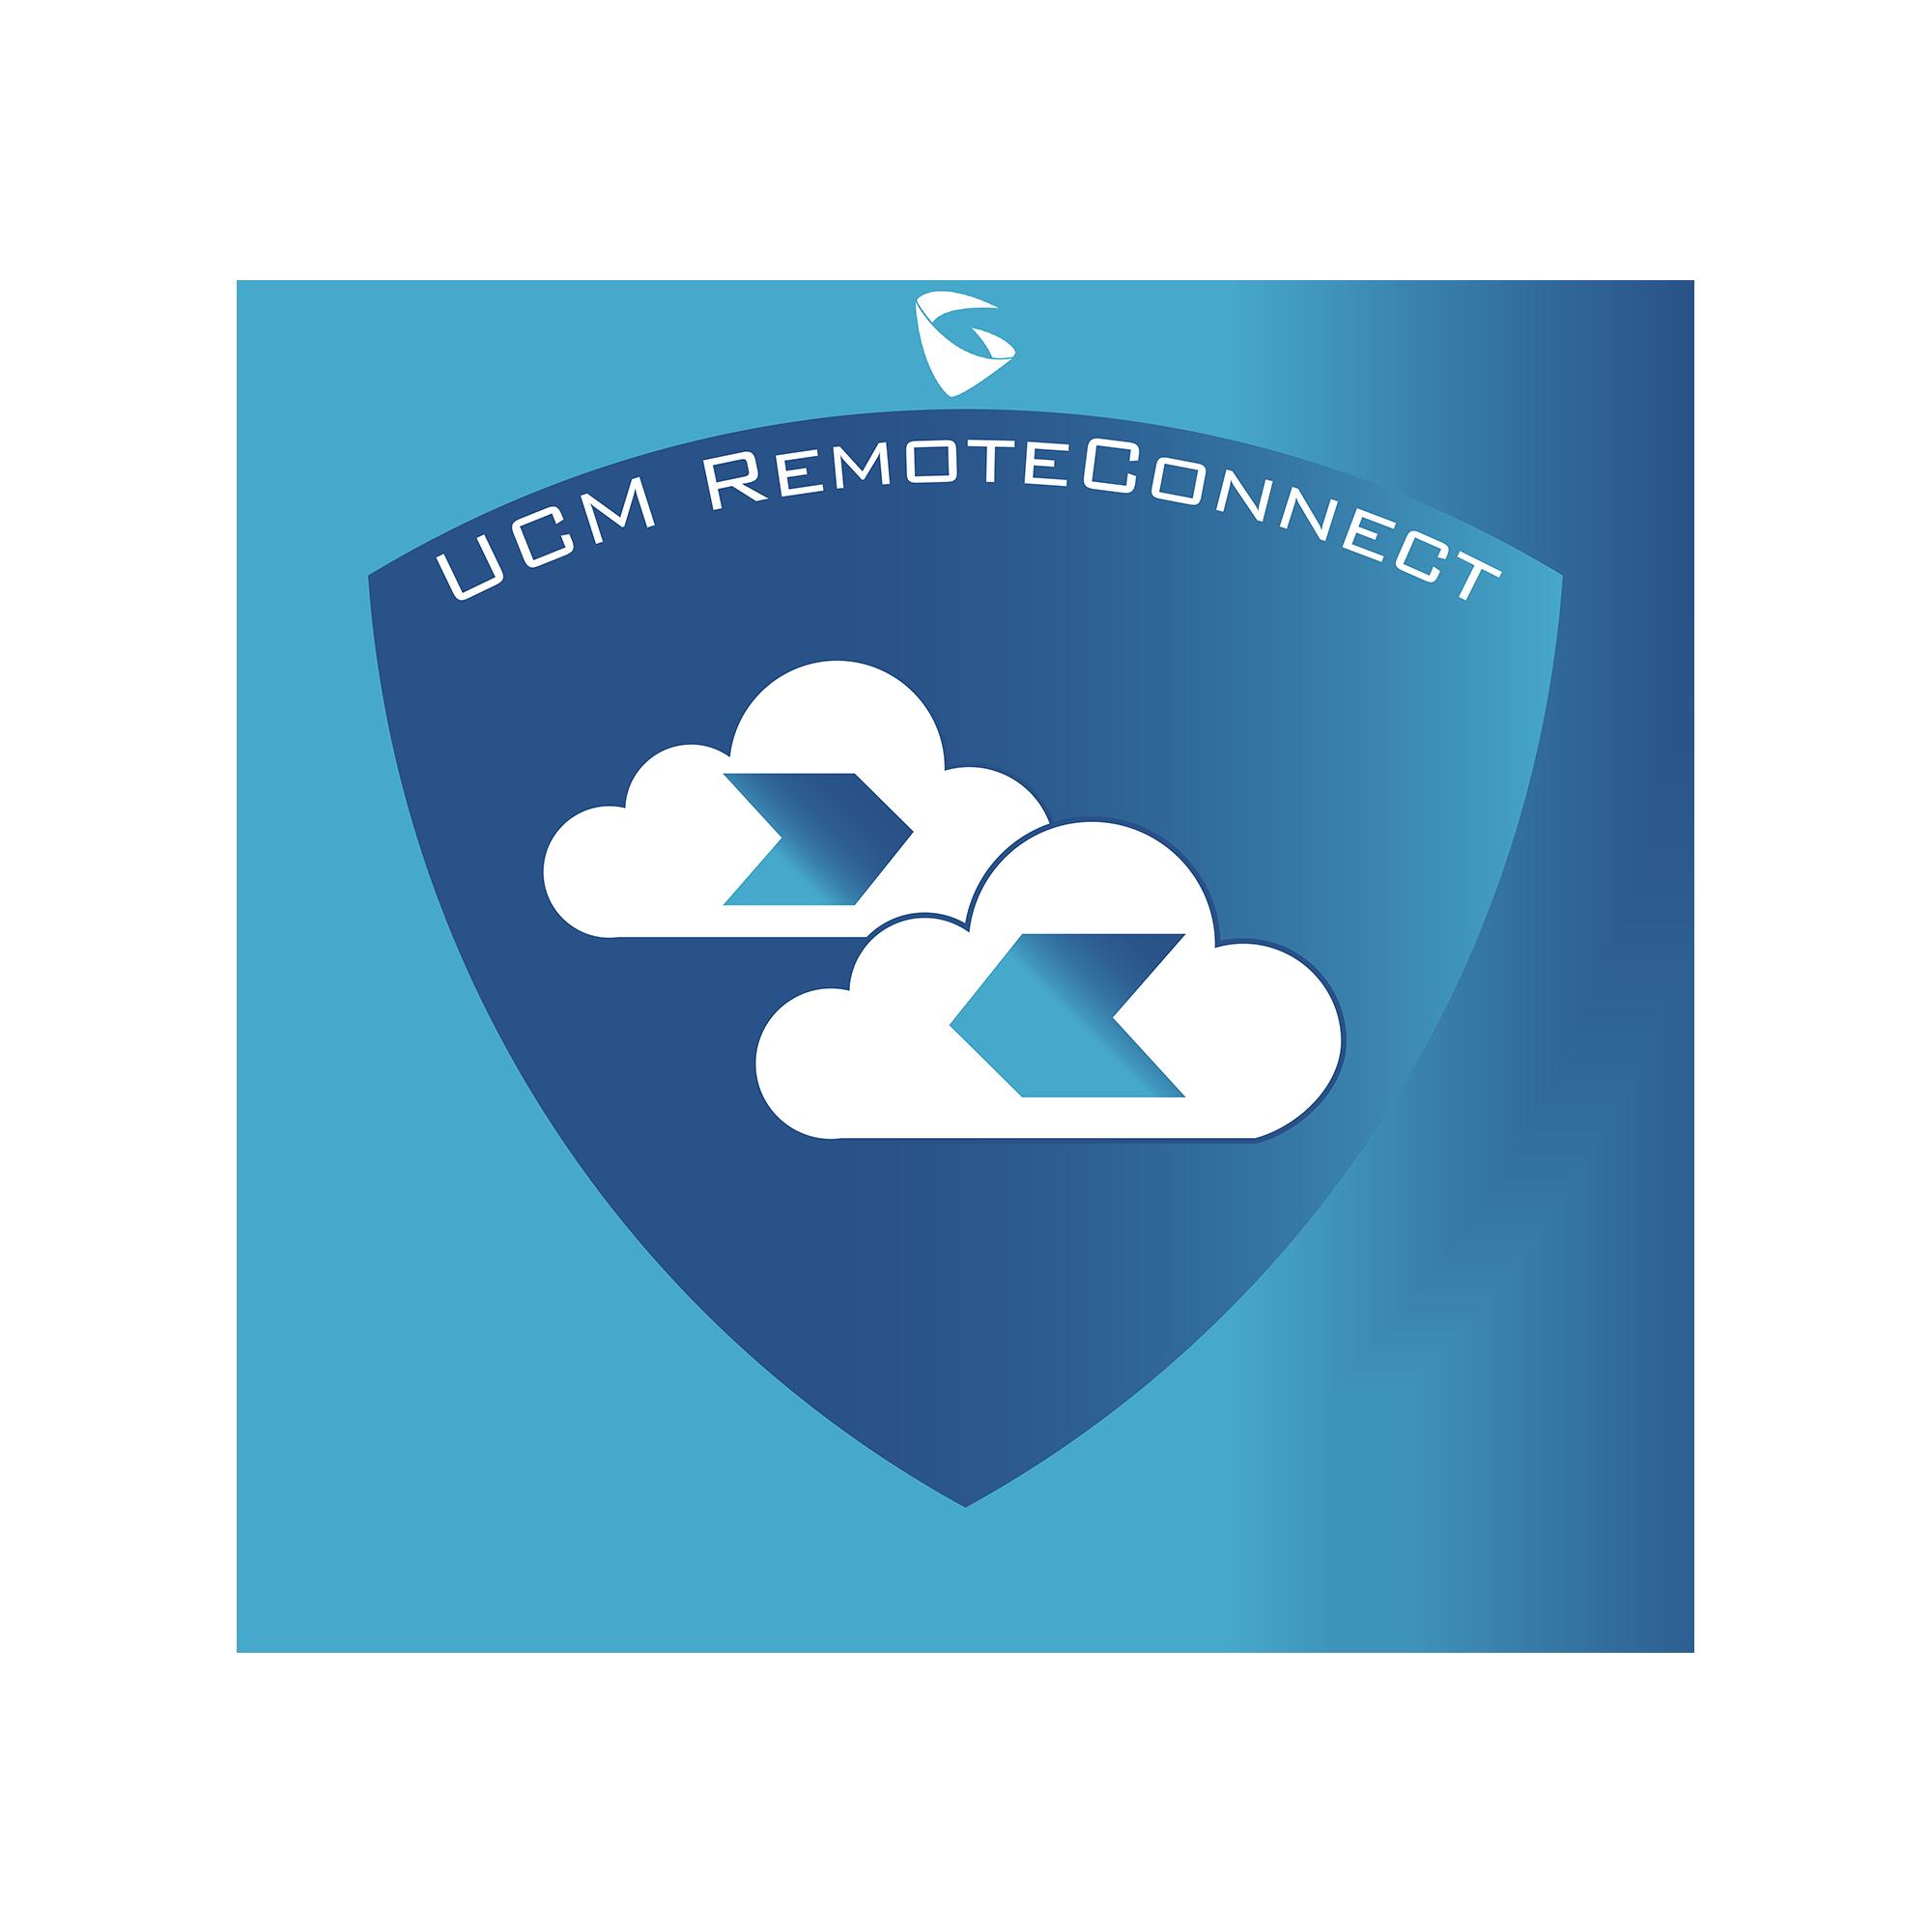 ucm_Remoteconnect_logo